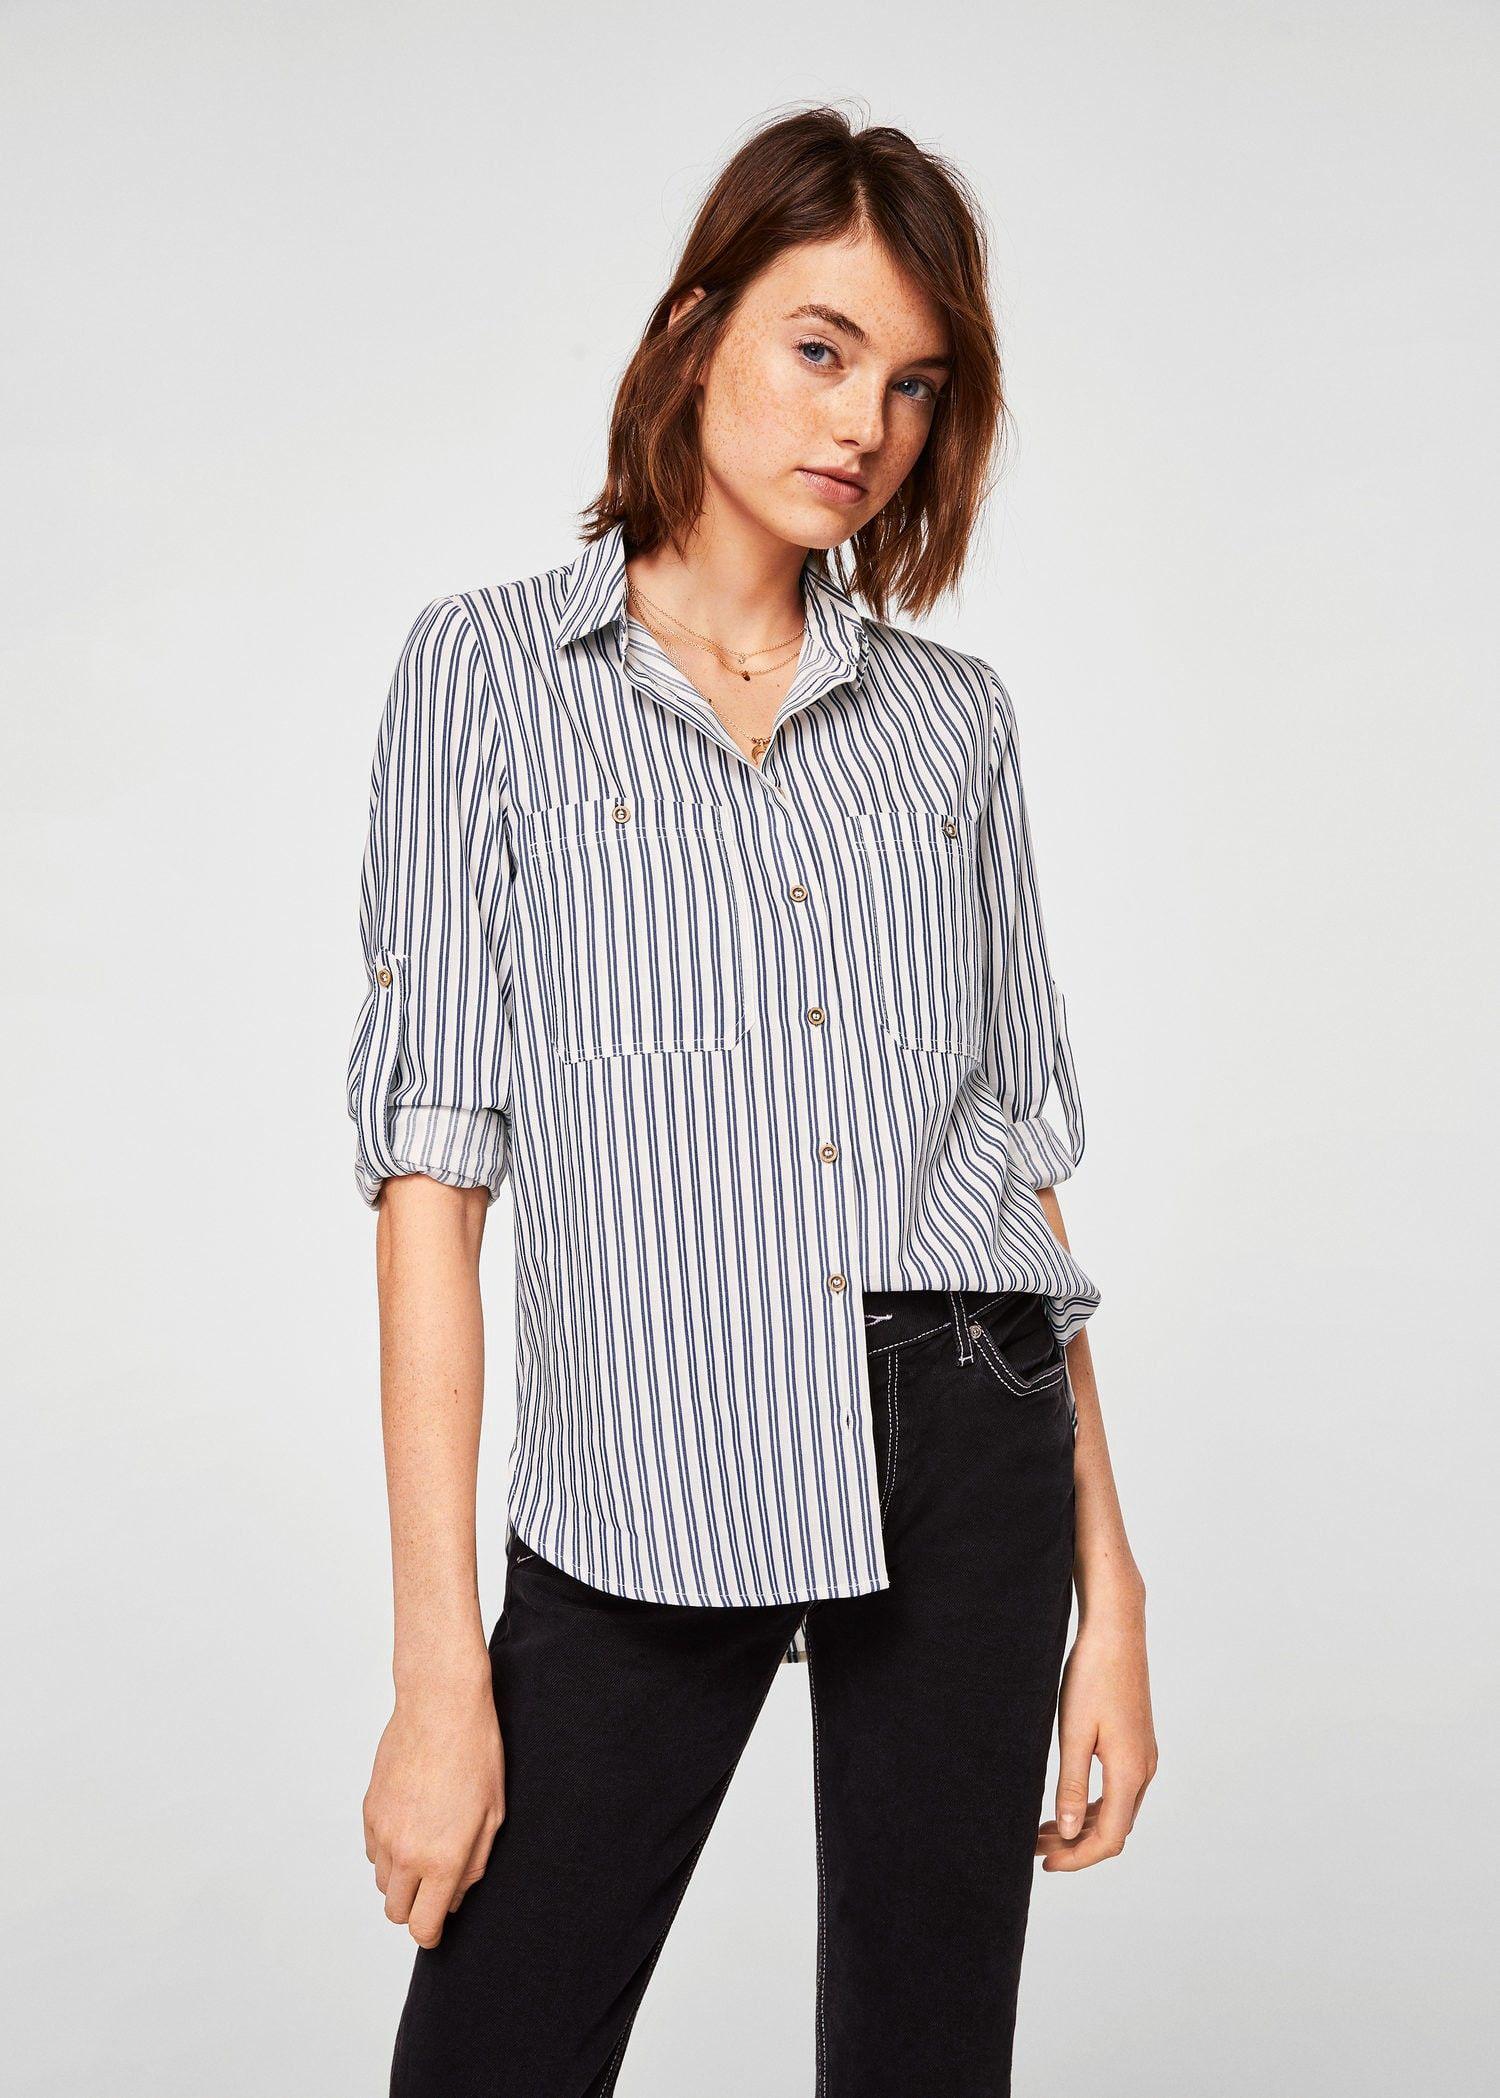 b6bdc45f8854bd Chest-pocket cotton shirt by Mango